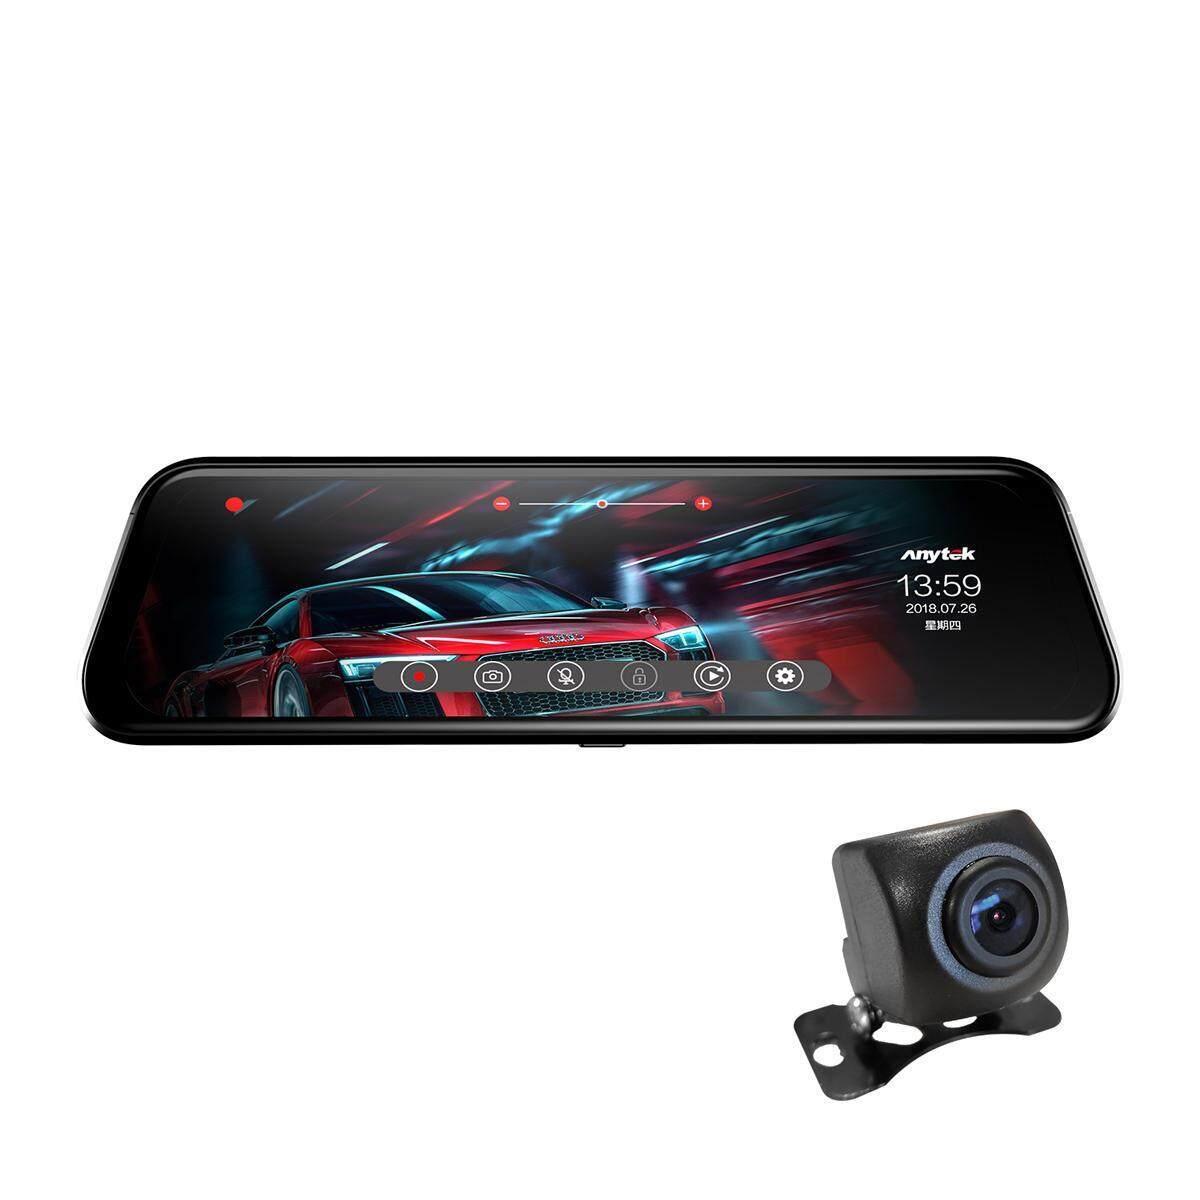 Anytek T12 + 9.66 นิ้วหน้าจอสัมผัส หน้า1080 P หลัง 720 P Dual เลนส์กล้อง Dvr กระจกมองหลัง Night Vision Dash Cam Video Recorder G - Sensor มีภาษาไทย รุ่นใหม่ล่าสุด ราคาถูกที่สุดในประเทศไทย.